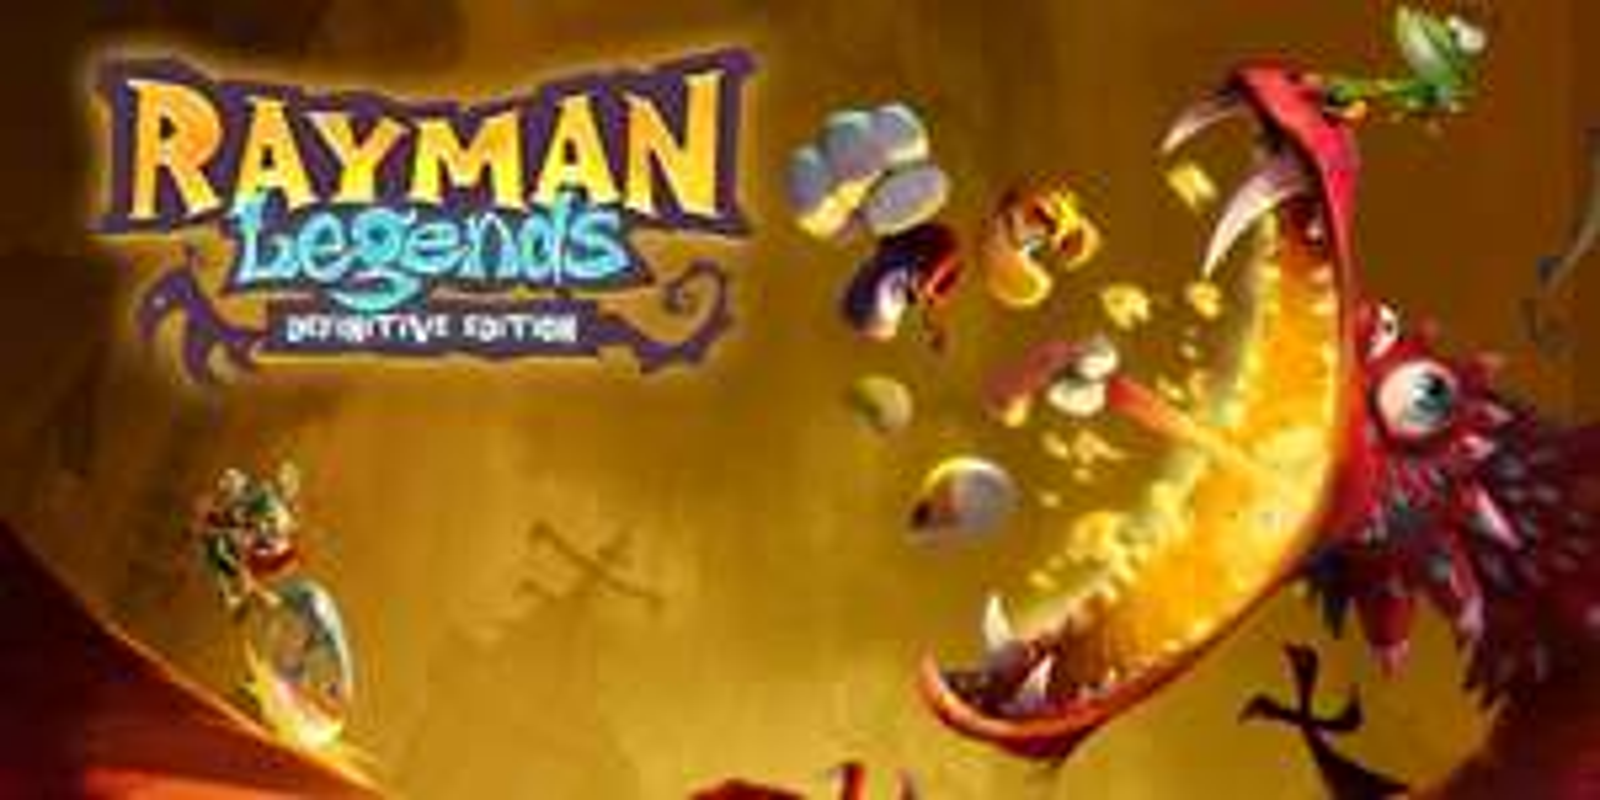 [Nintendo] Rayman Legends - Definitive Edition Switch